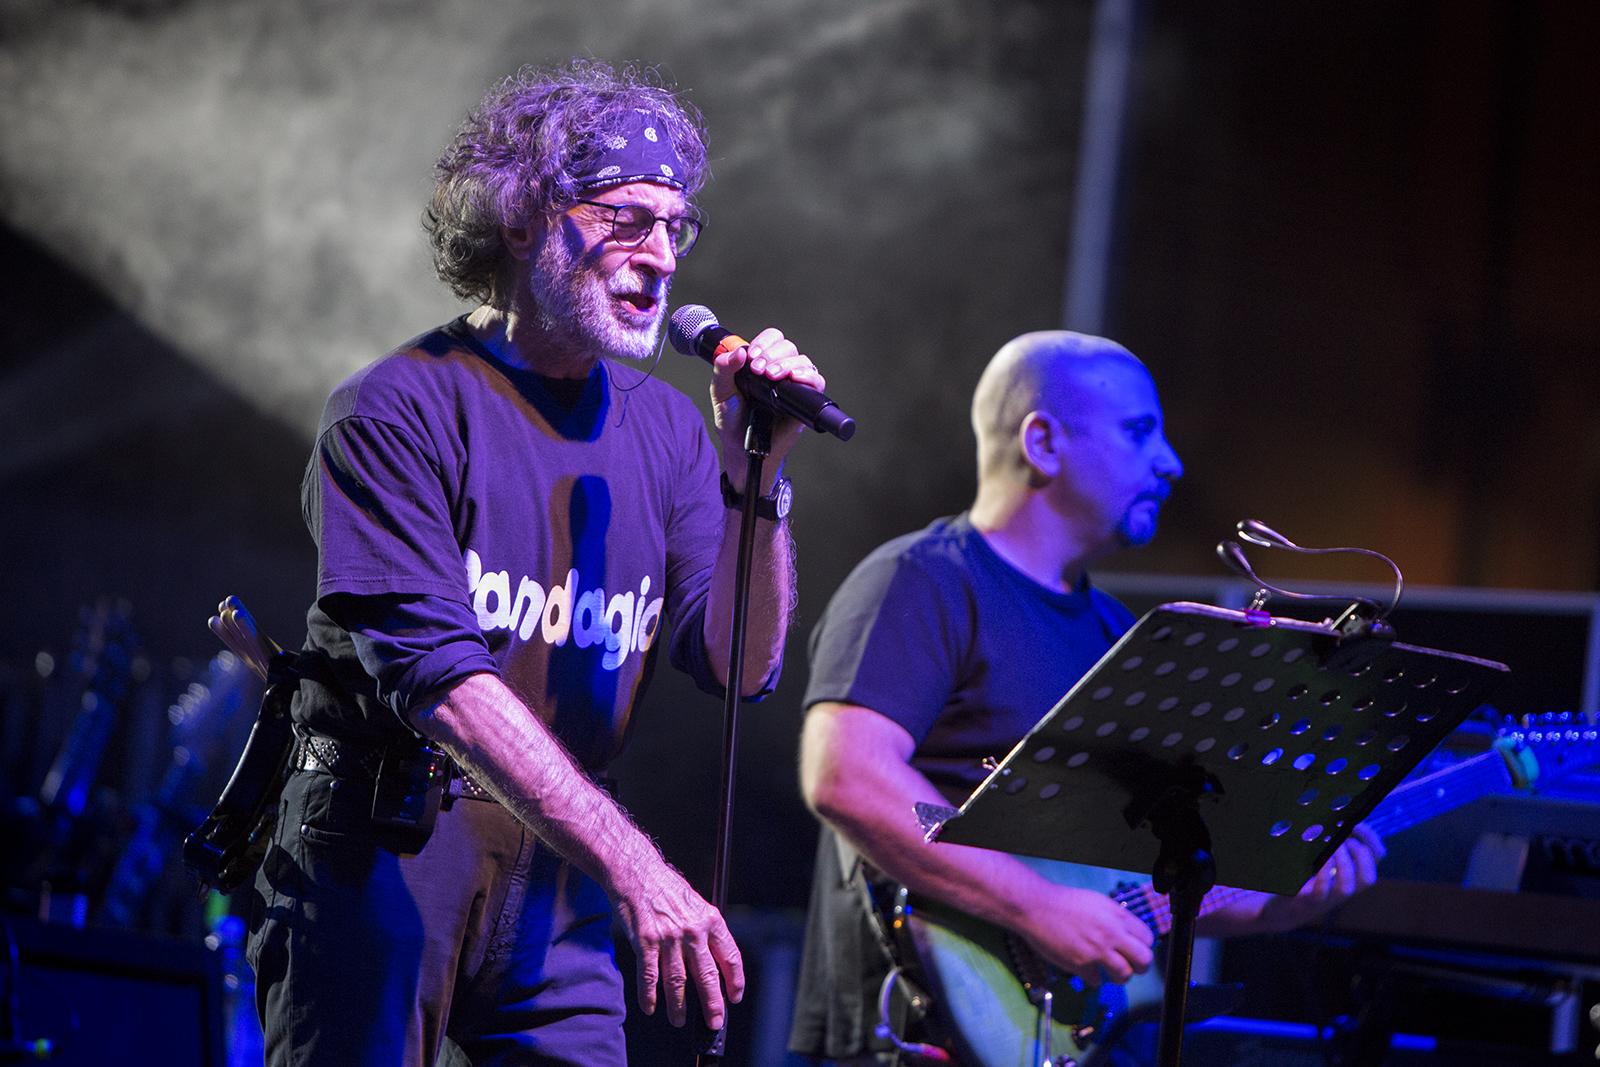 FOTO: Premiata Forneria Marconi @ Festival Folkest, Koper 20.7.2019